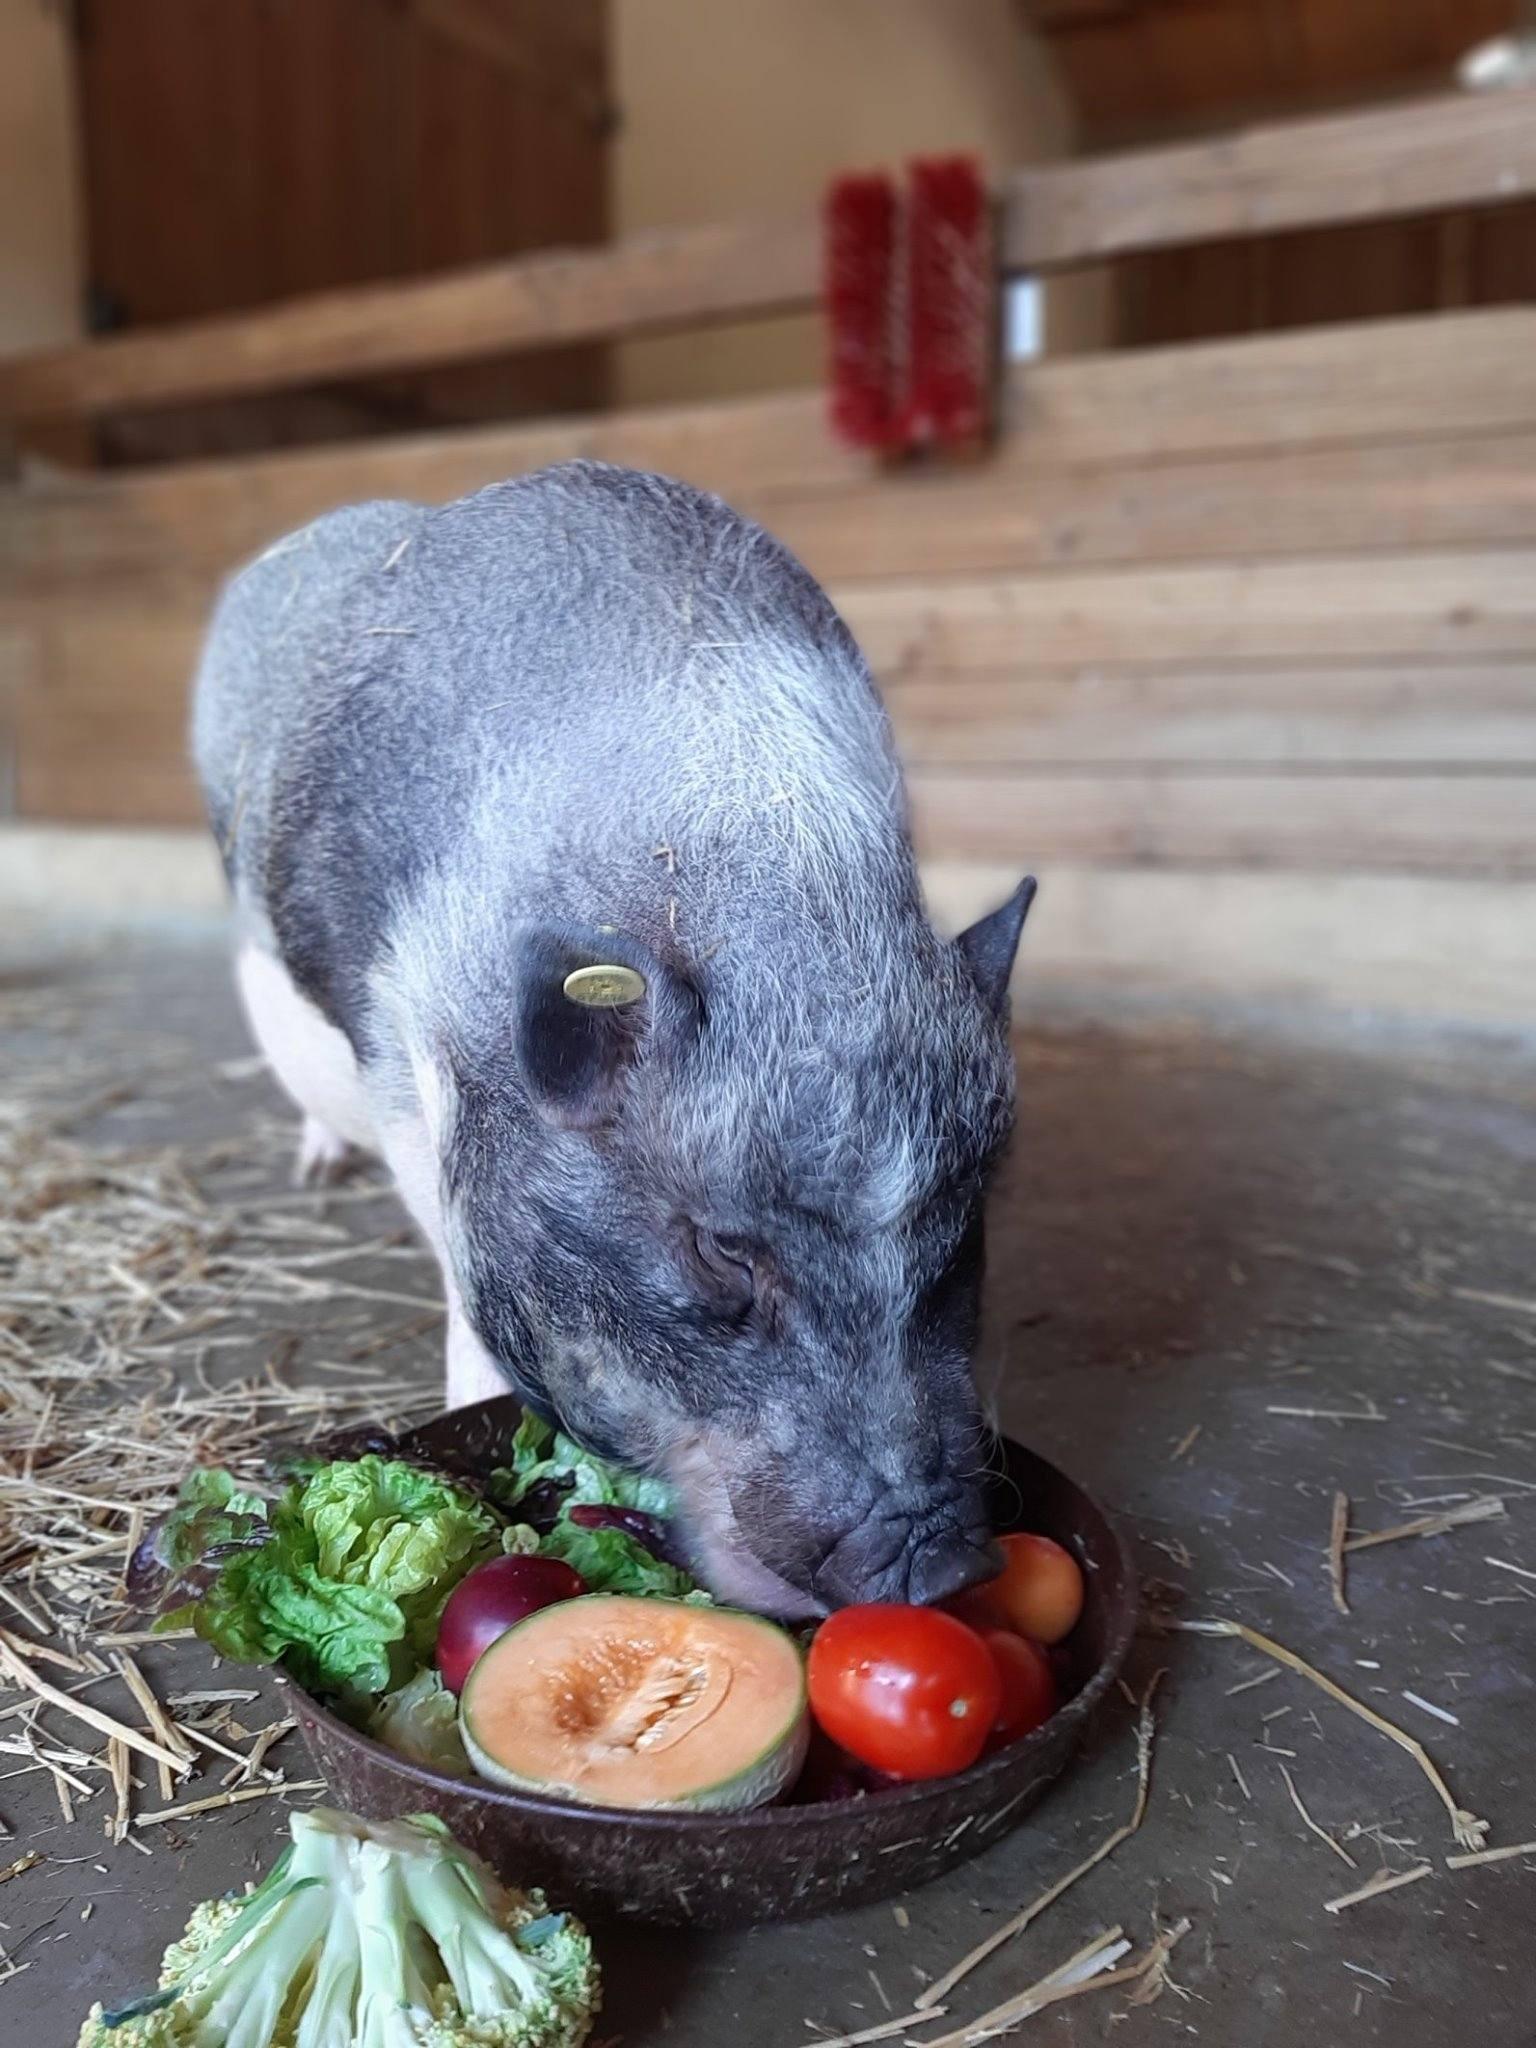 Pig at Children's Farm